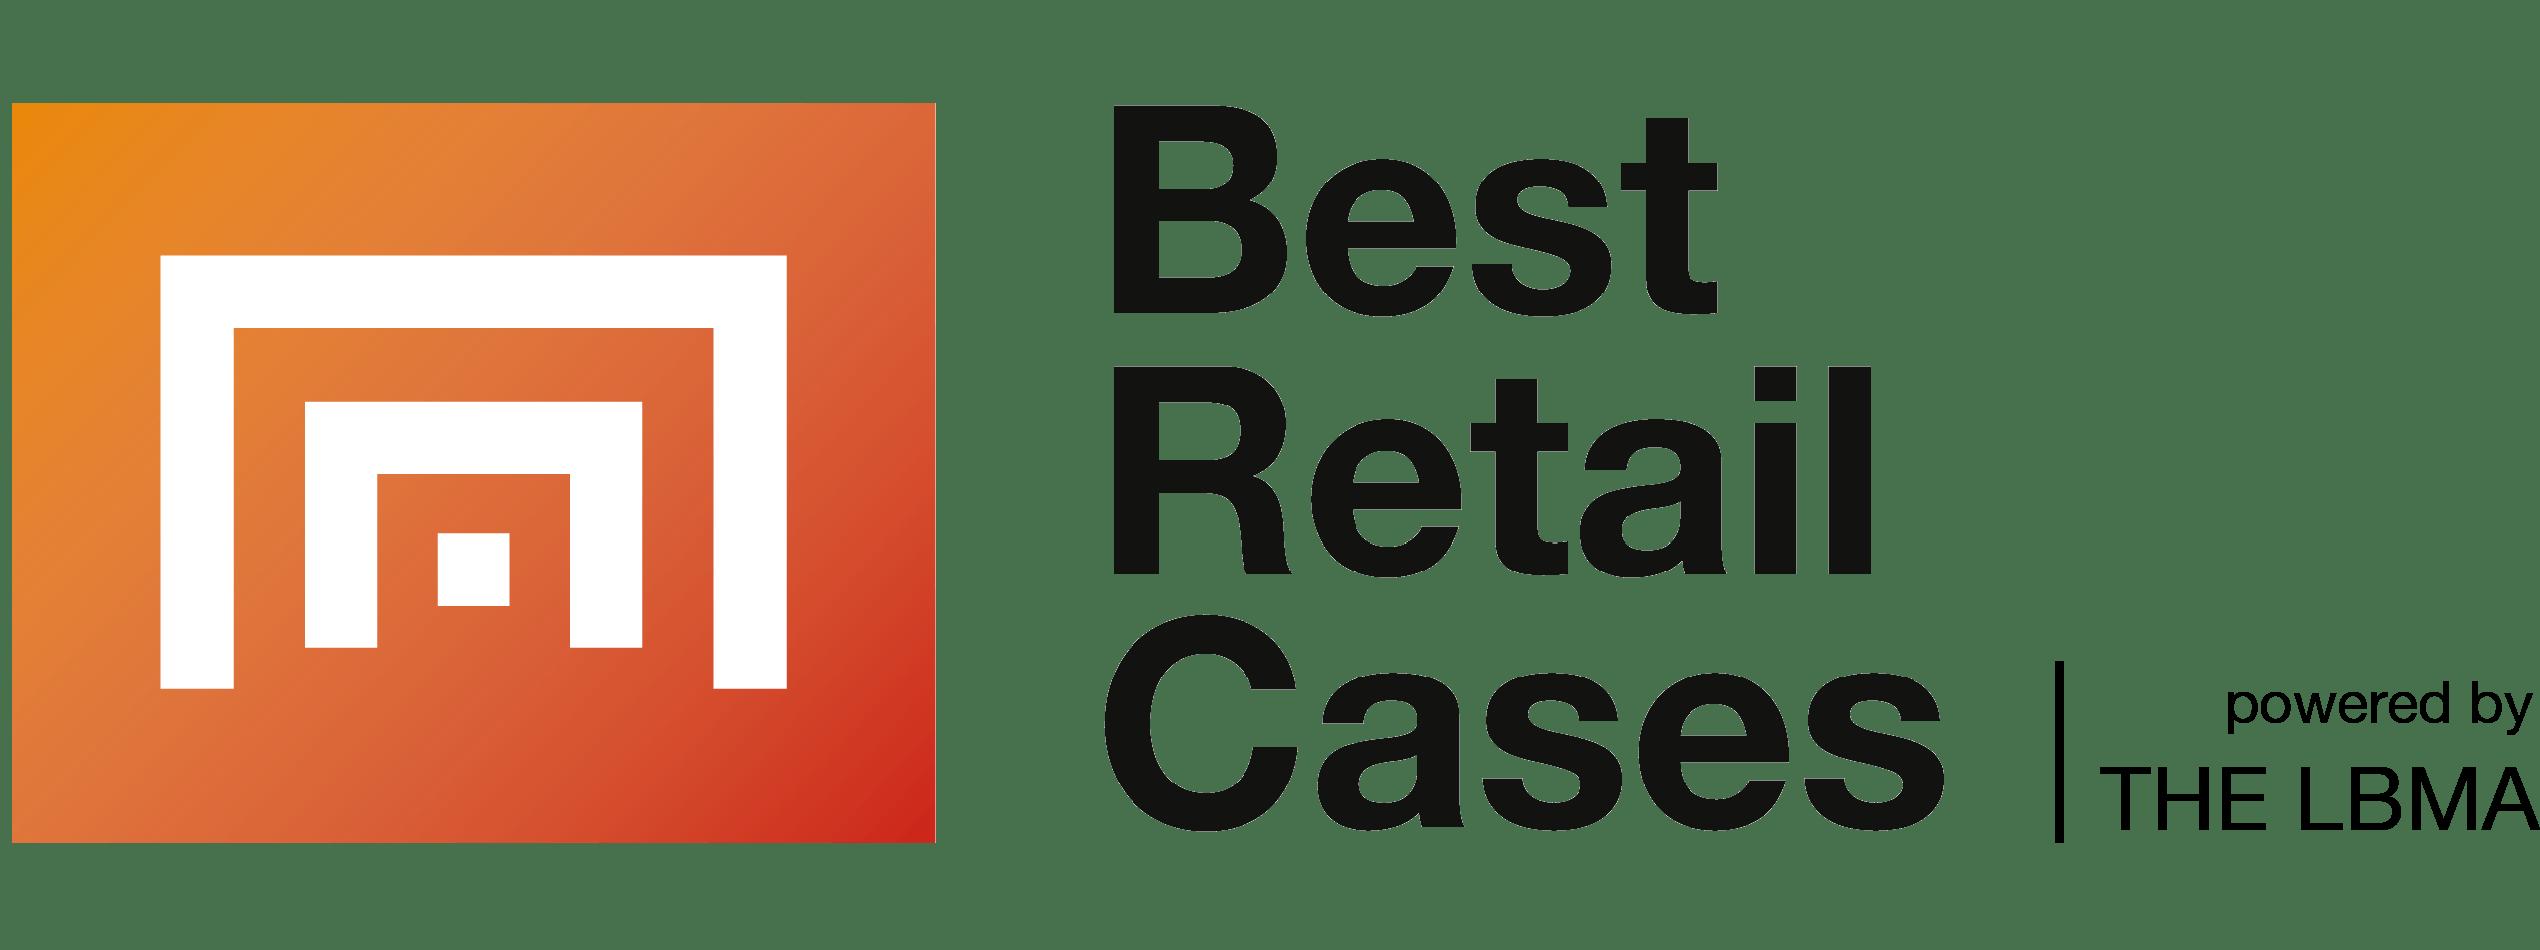 Best Retail Cases